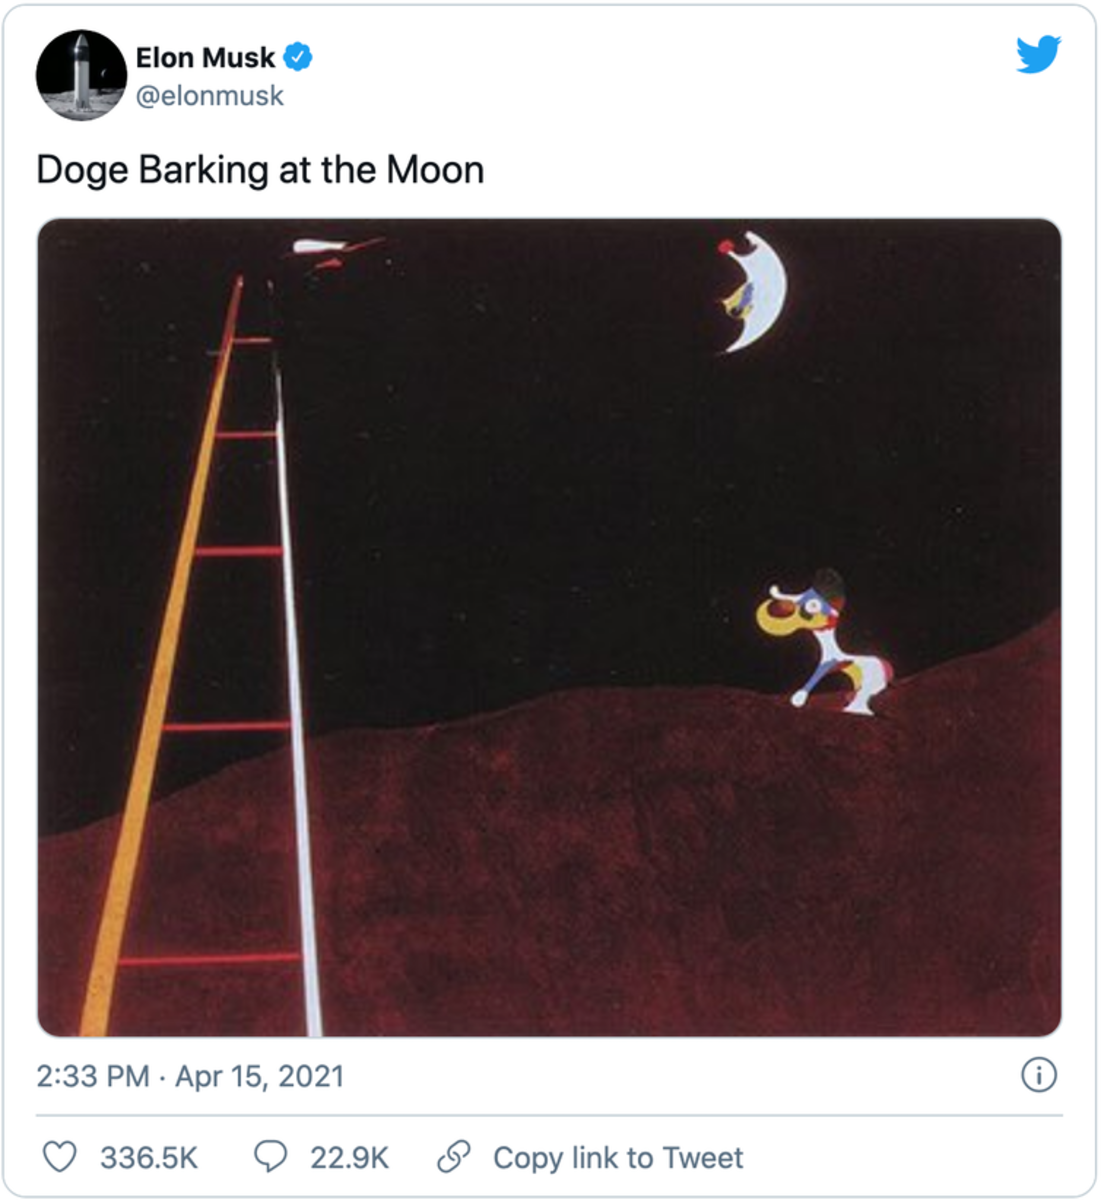 Elon Musk's social media posts move markets. Twitter